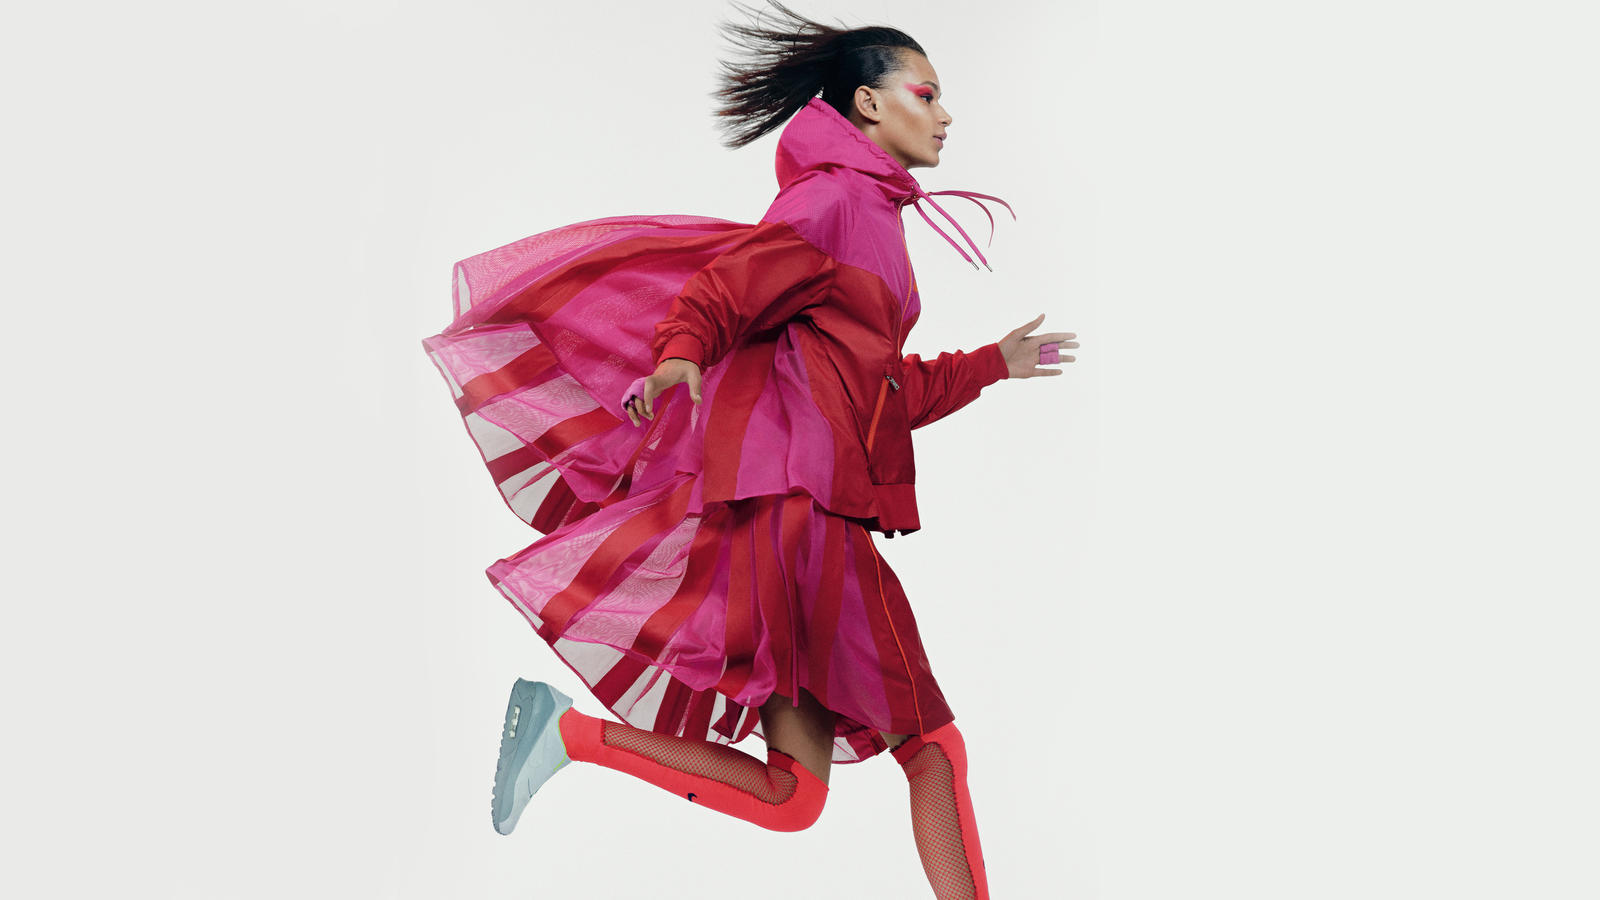 Binx wearing NikeLab x sacai